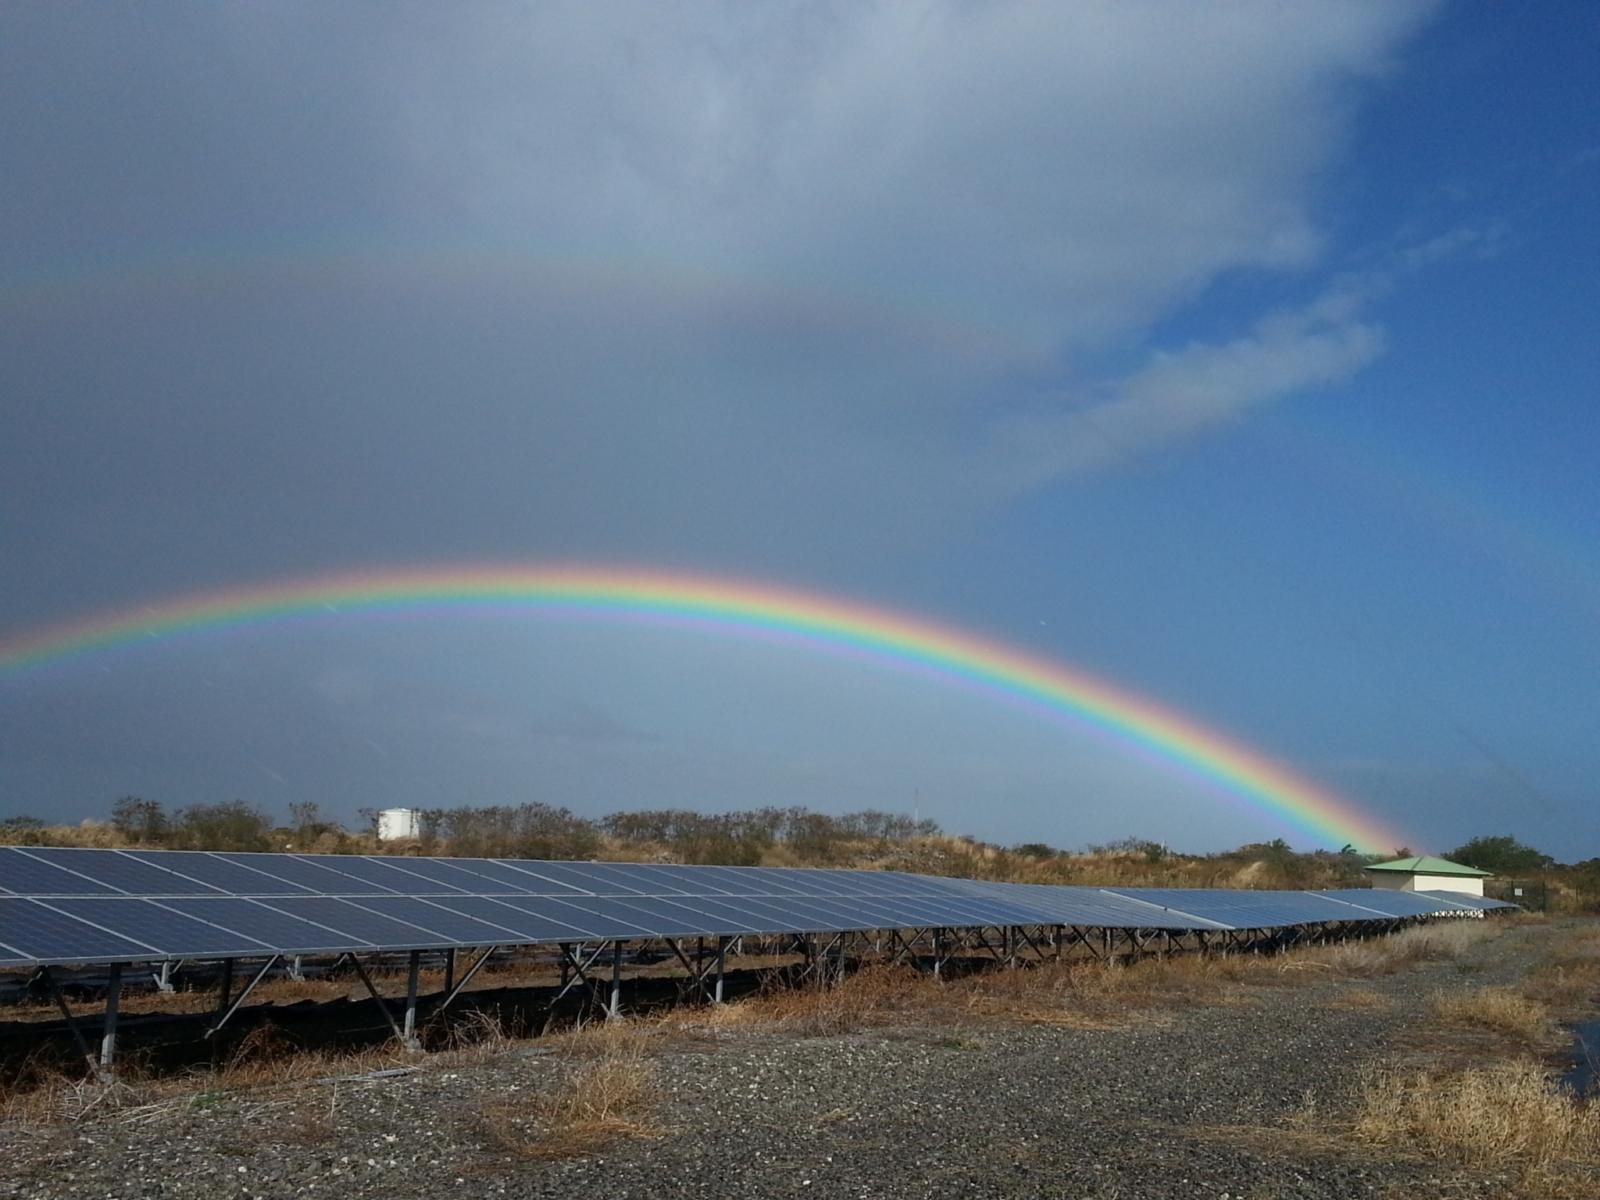 Towards a massive development of solar energy